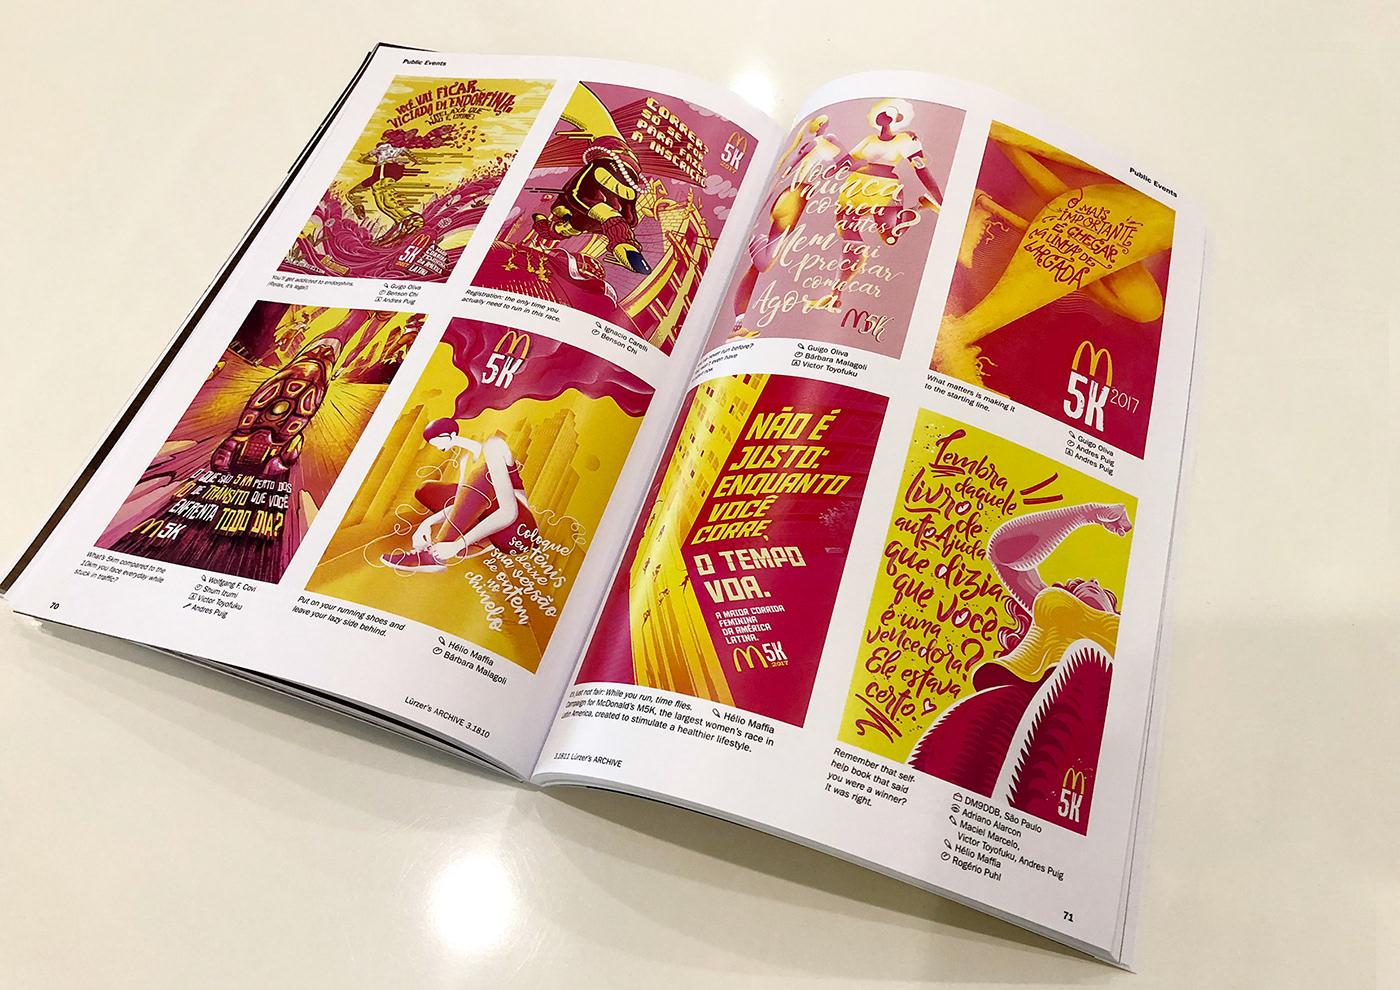 mcdonald's,race,Marathon,Nike,adidas,design,poster,puma,5k,woman